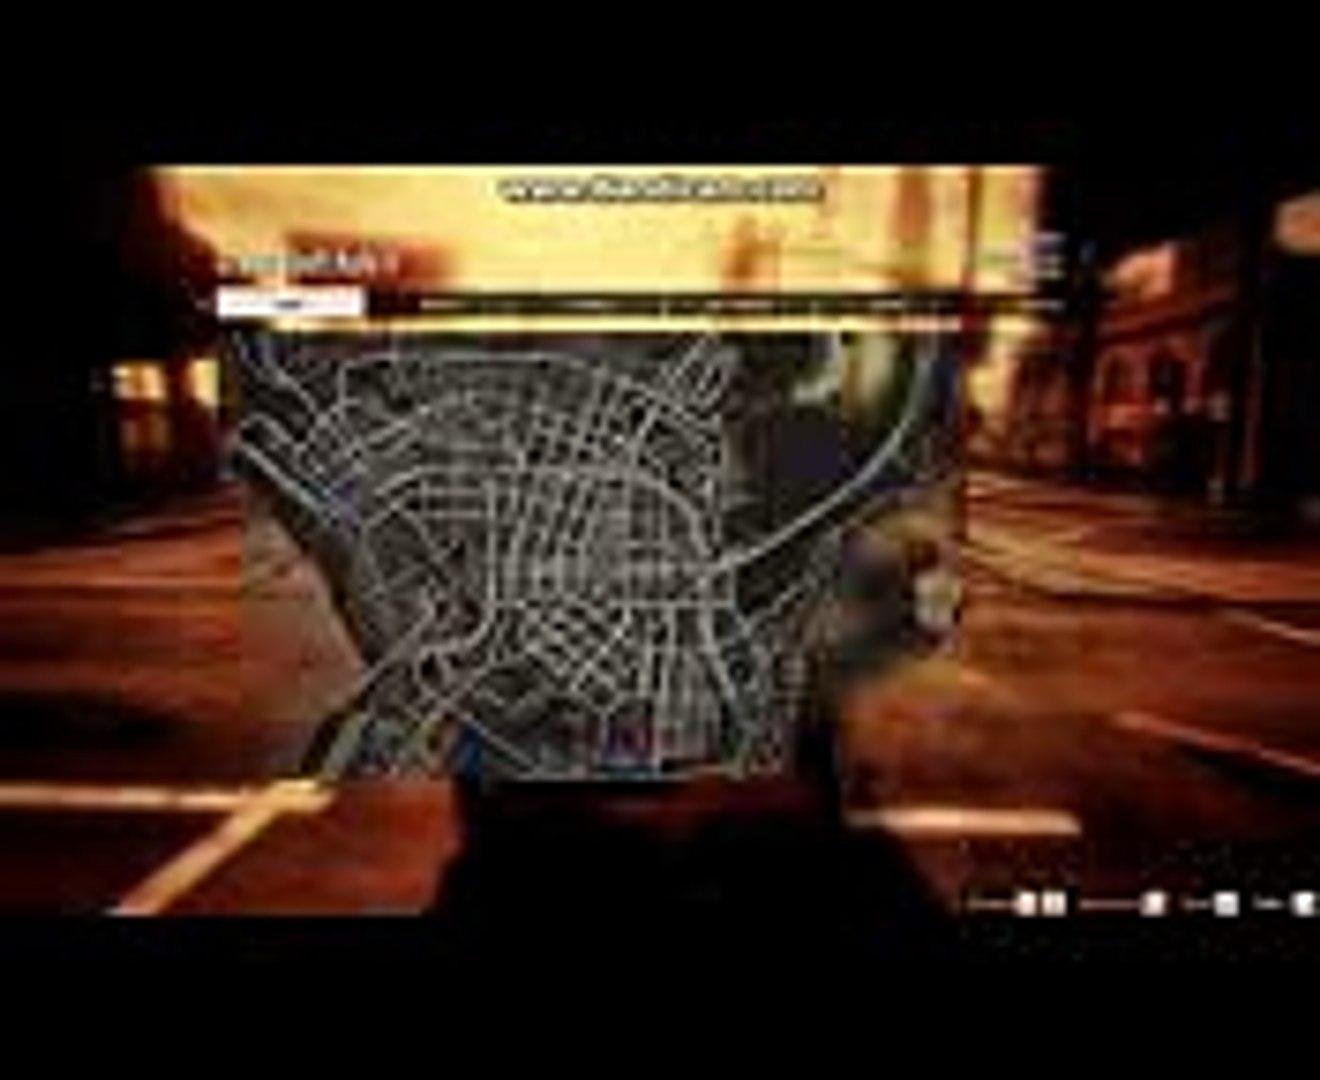 Nvidia Geforce 820M Gta 5 idea gallery